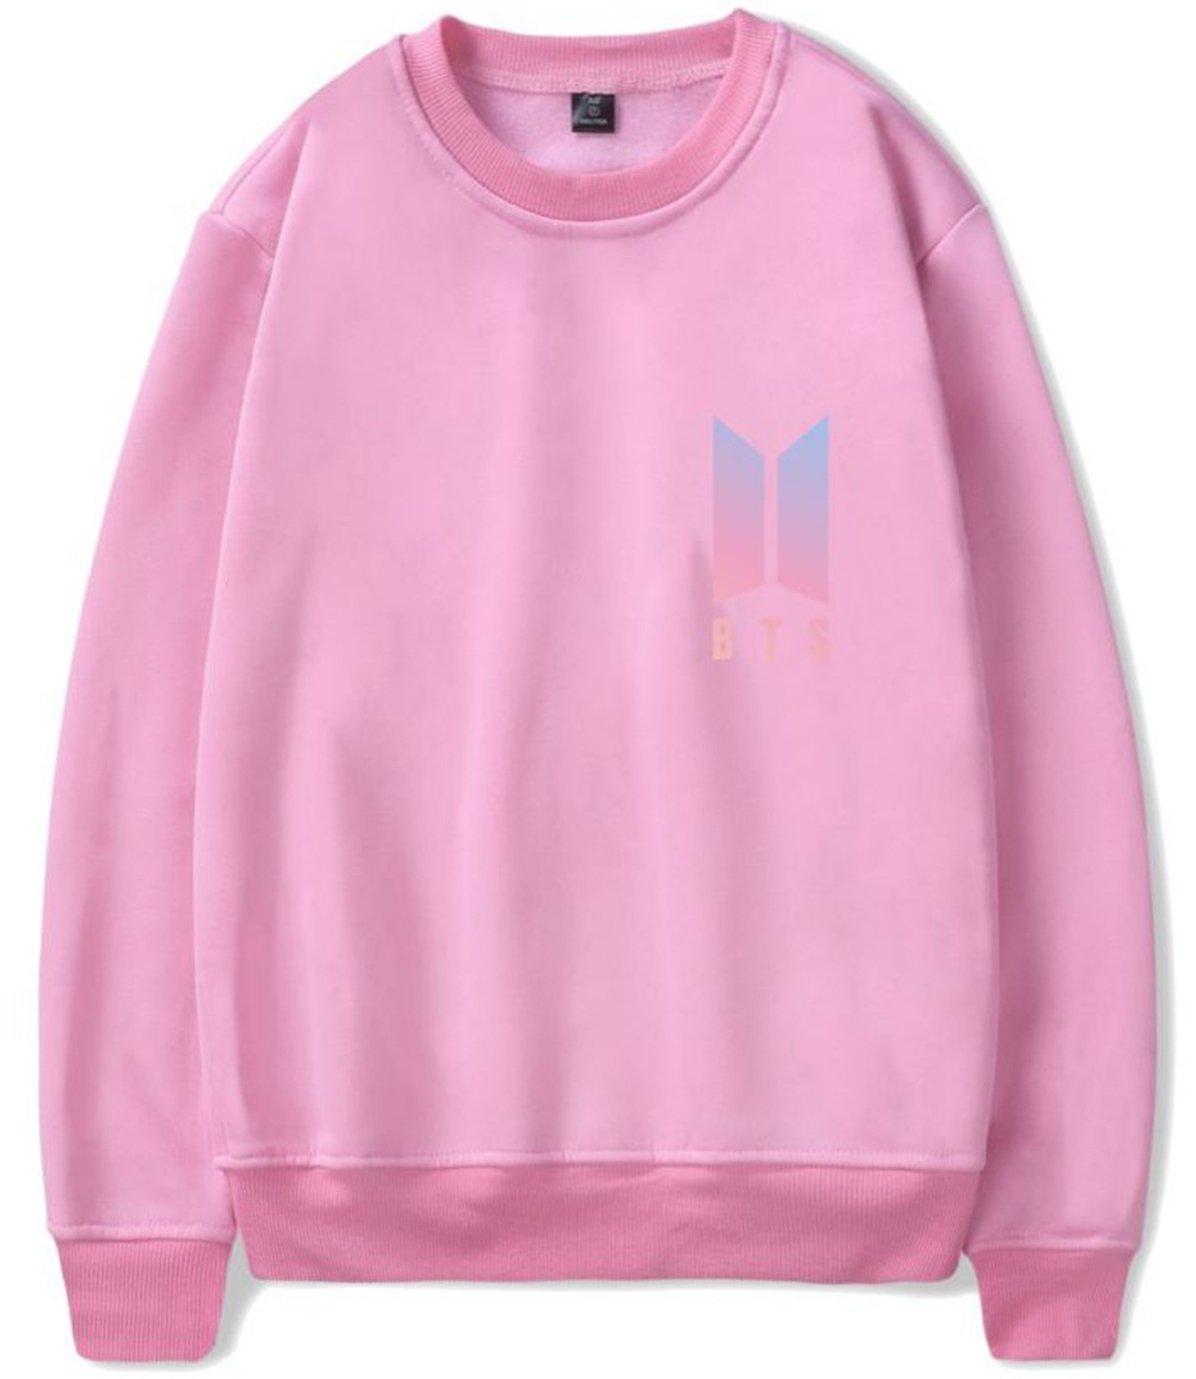 SERAPHY Unisex BTS Hoodies Bangtan Boys Sweatshirts Crew Neck Jumper Suga Jin Jimin Jung Kook J-Hope Rap-Monster V Pink-92 M